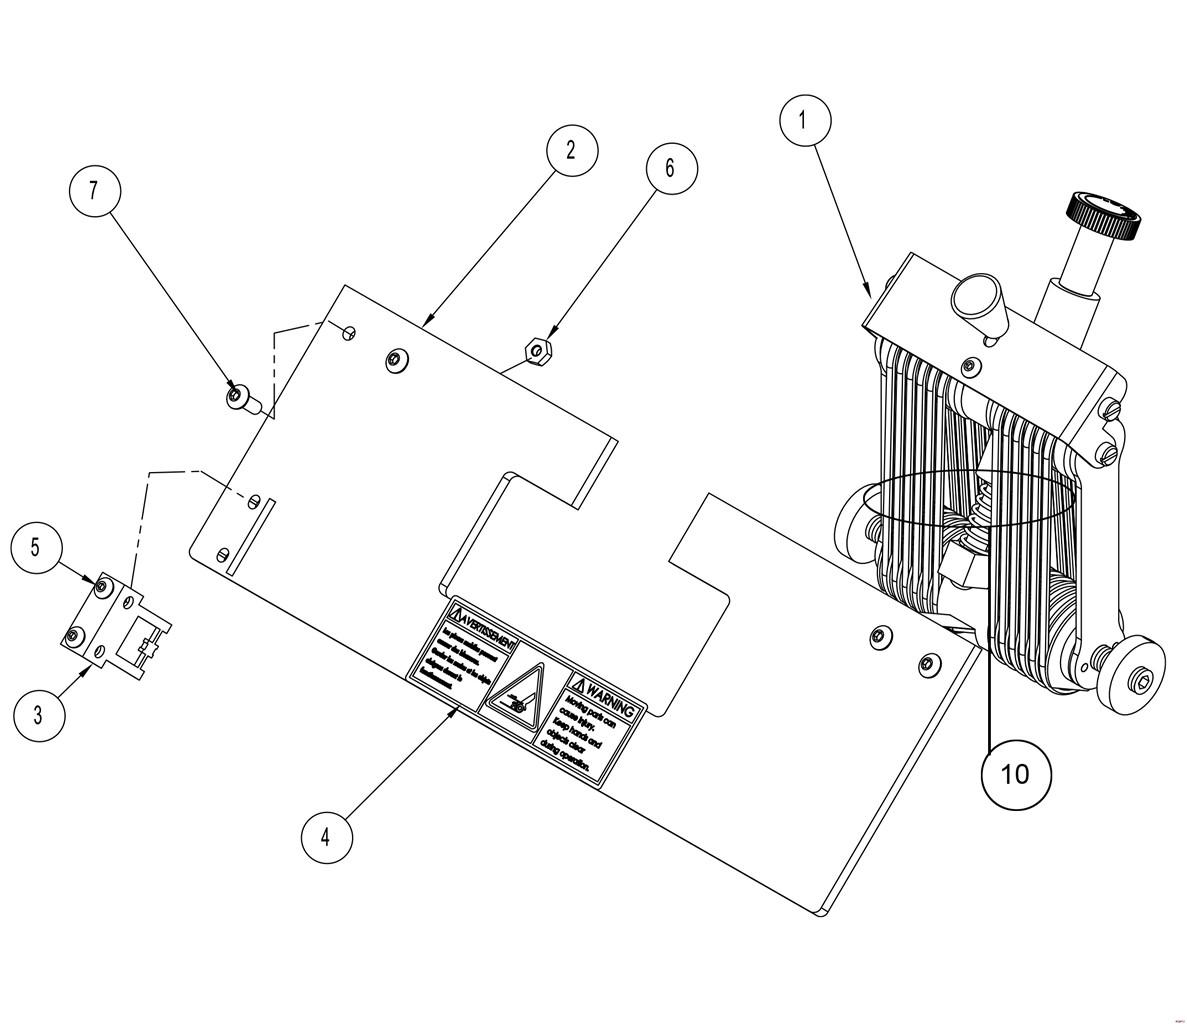 https://www.argecy.com/images/Conveyor-16_cr.jpg